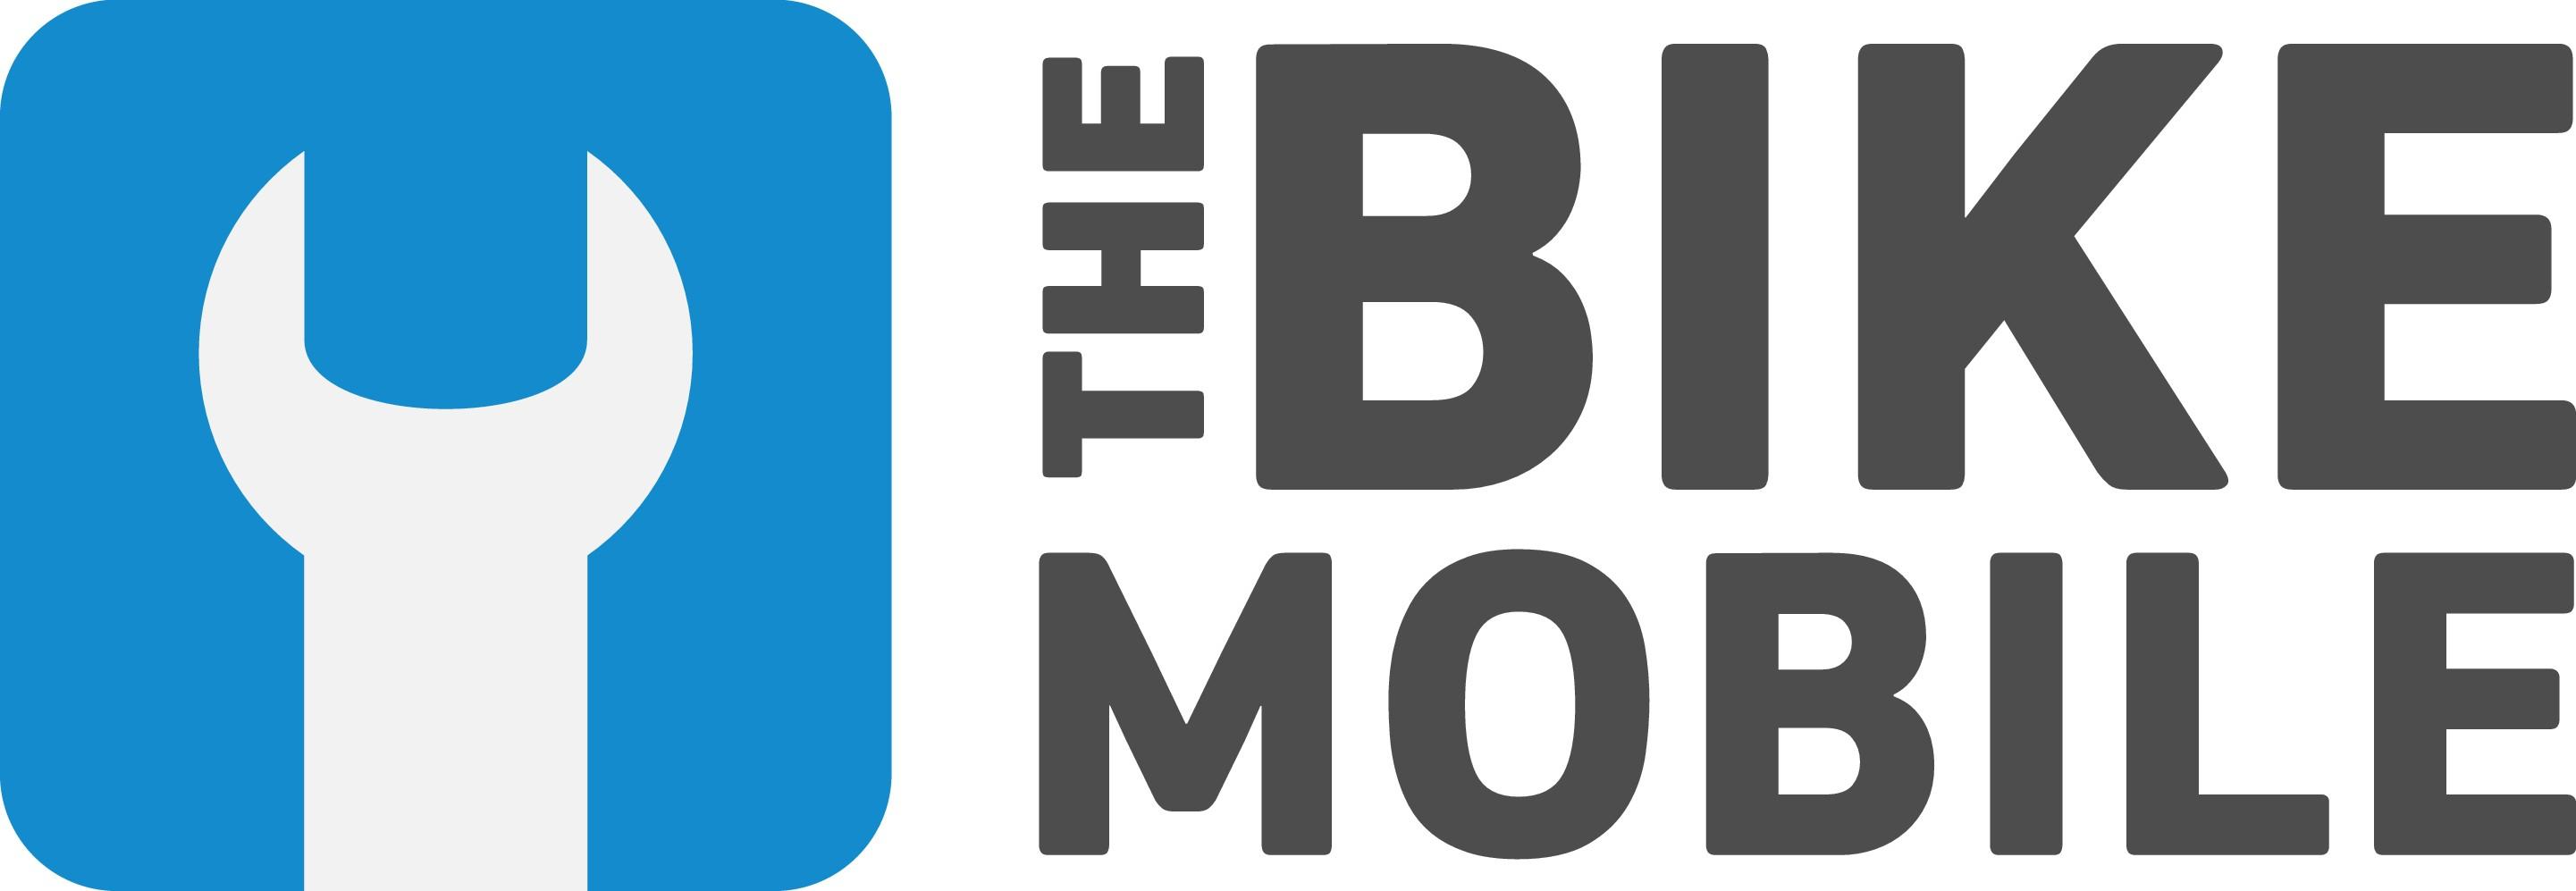 Create an unforgettable unique image for The BikeMobile mobile bike shop